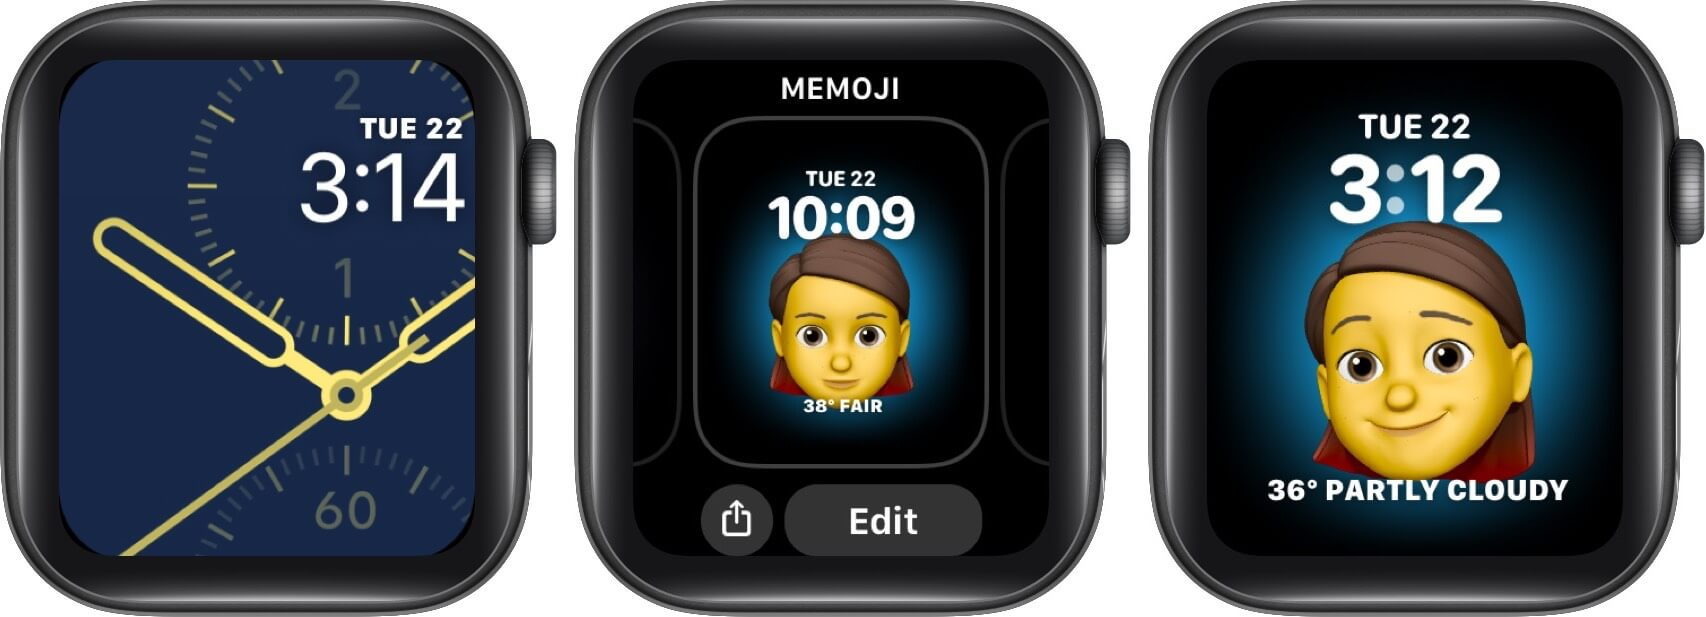 set memoji as watch face on apple watch